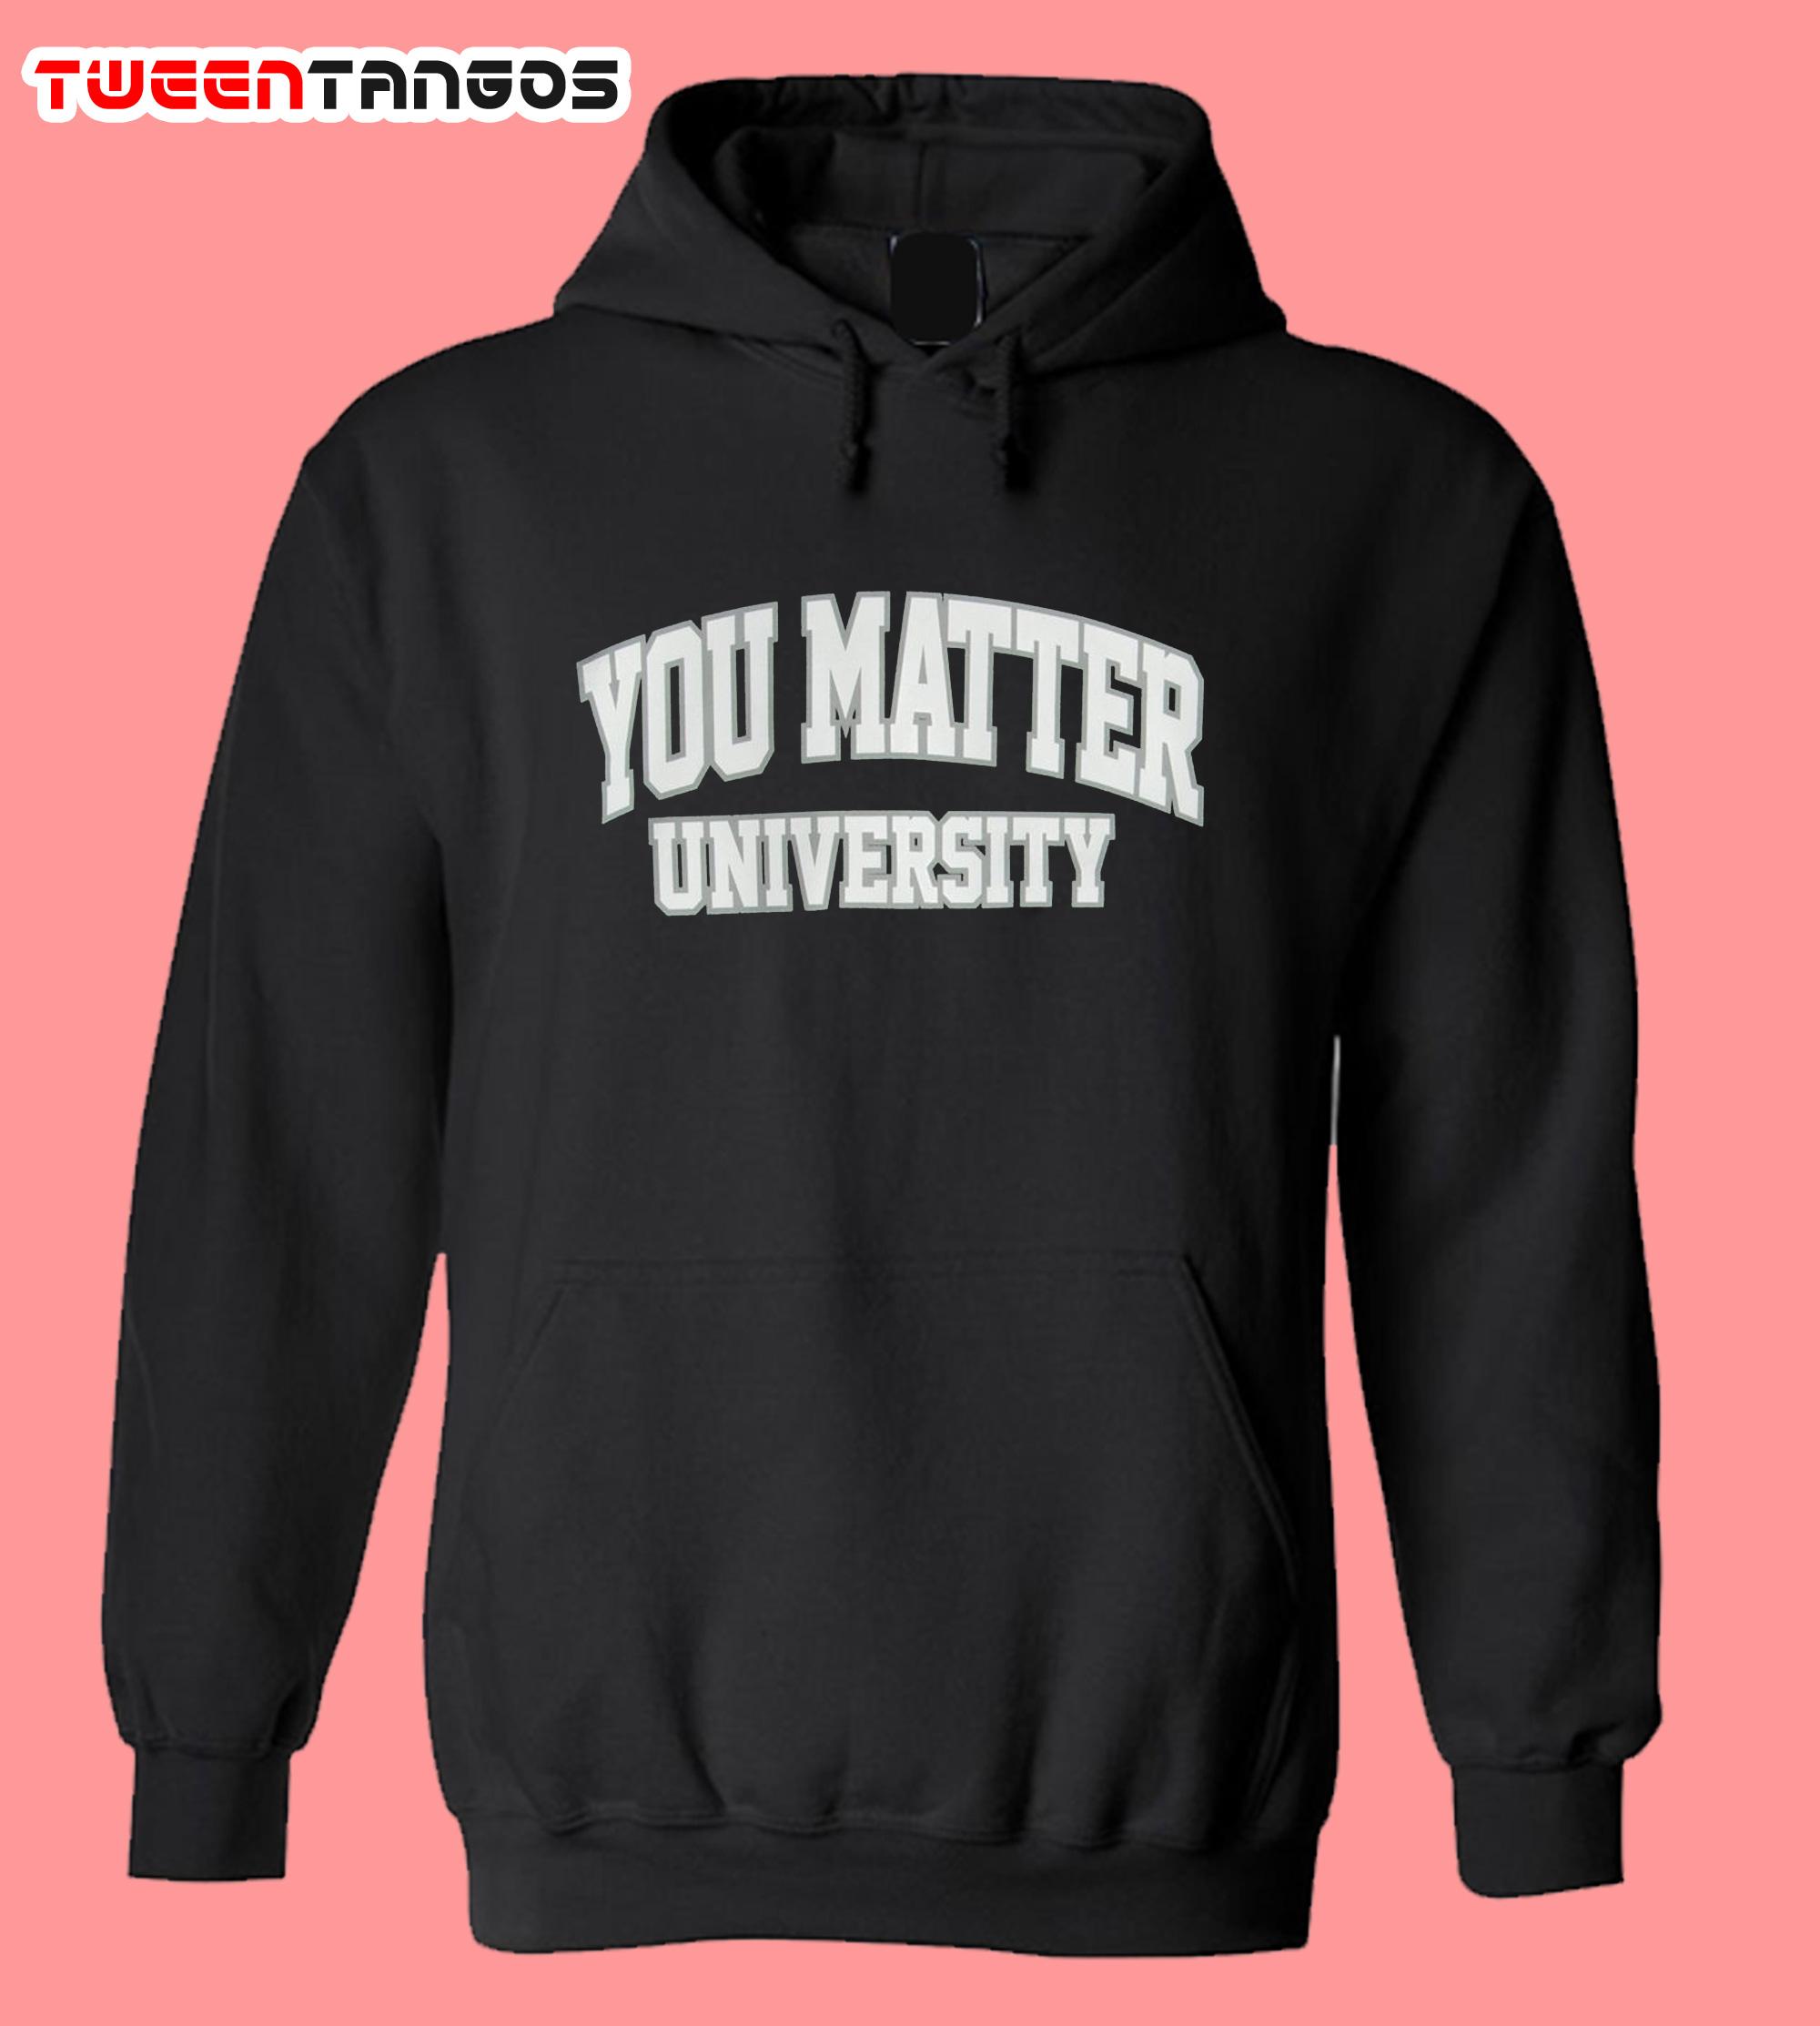 You Matter University Hoodie